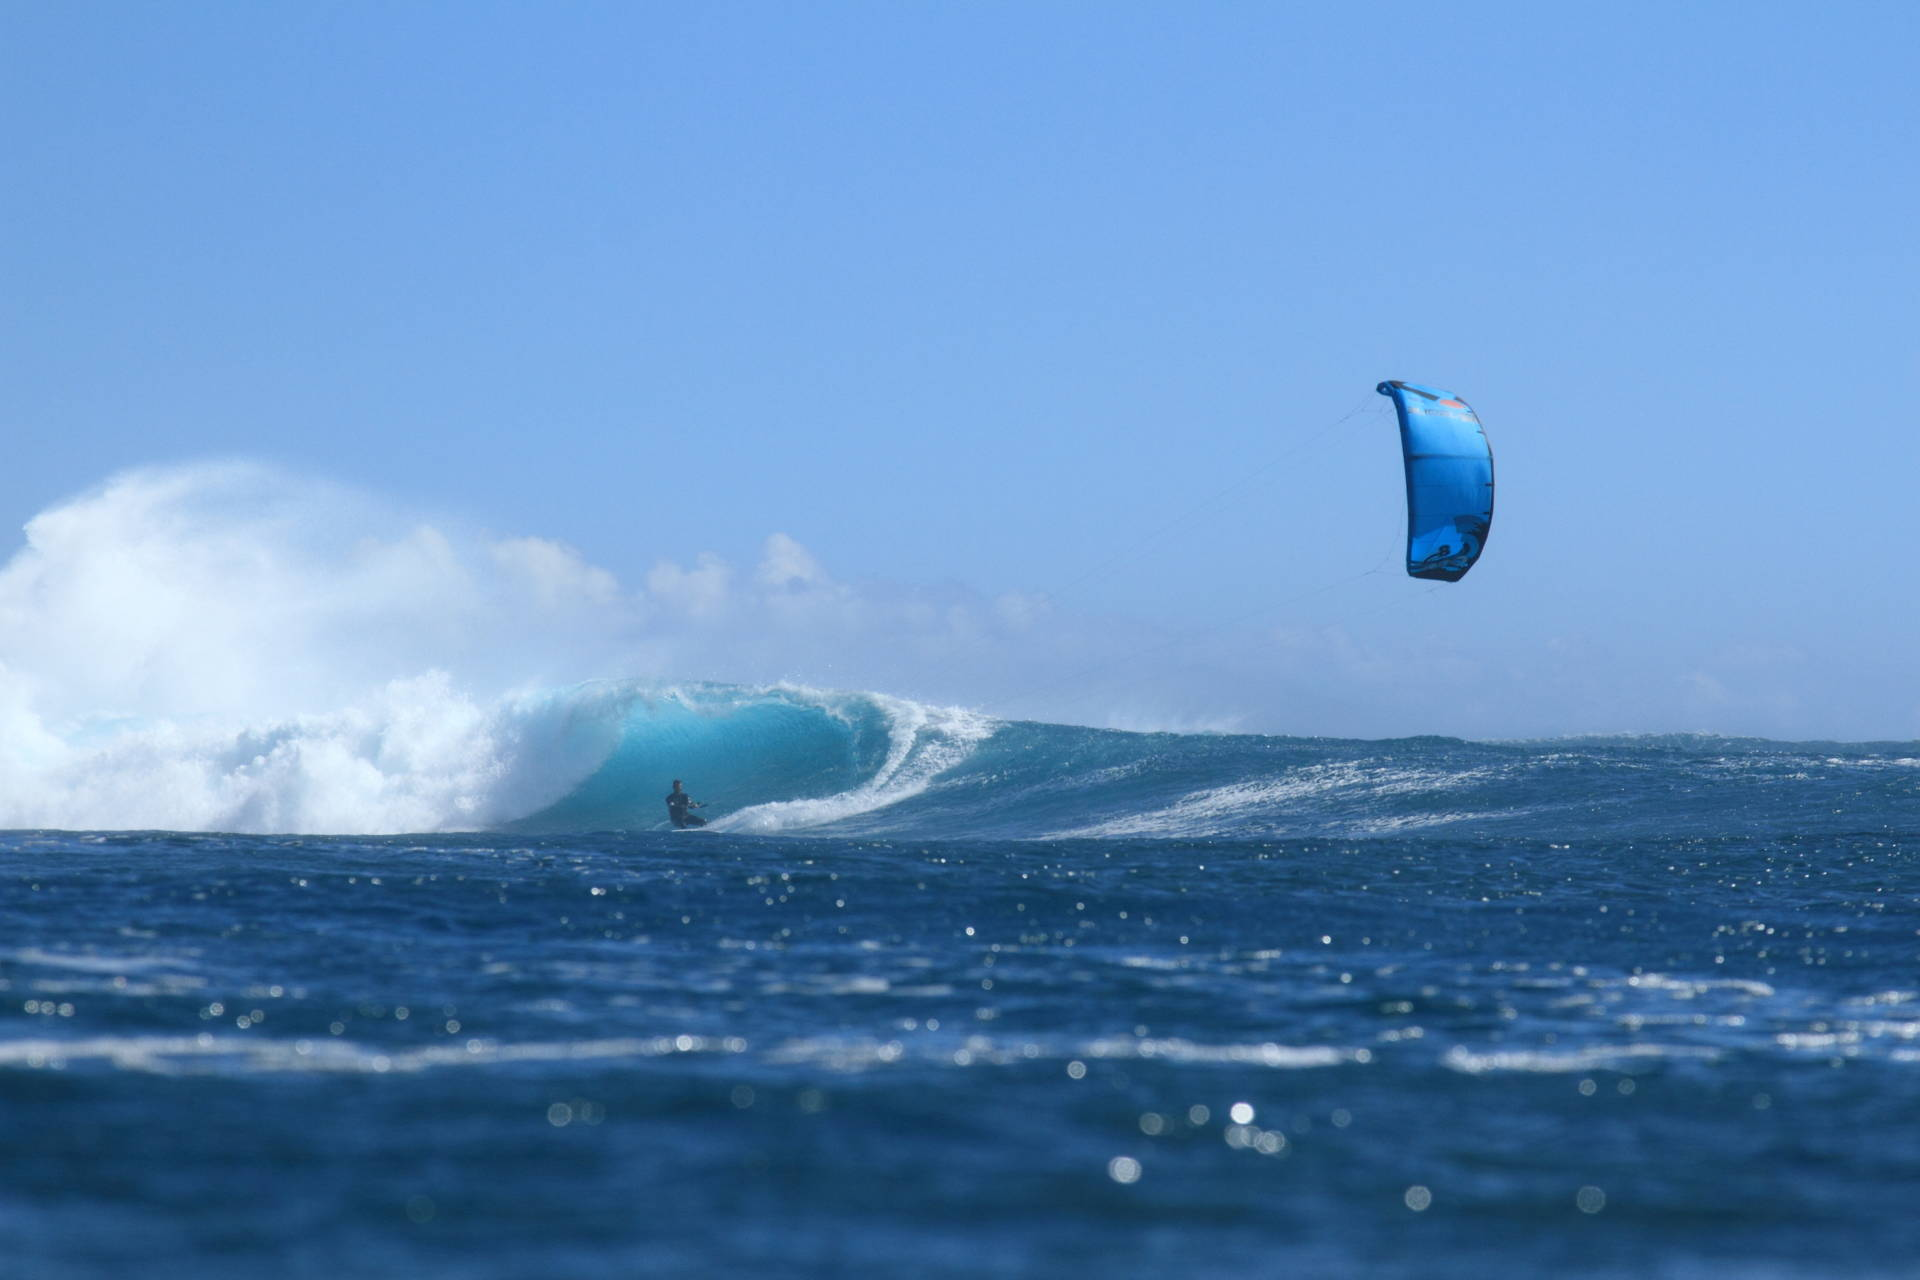 water expeditions kitesurf